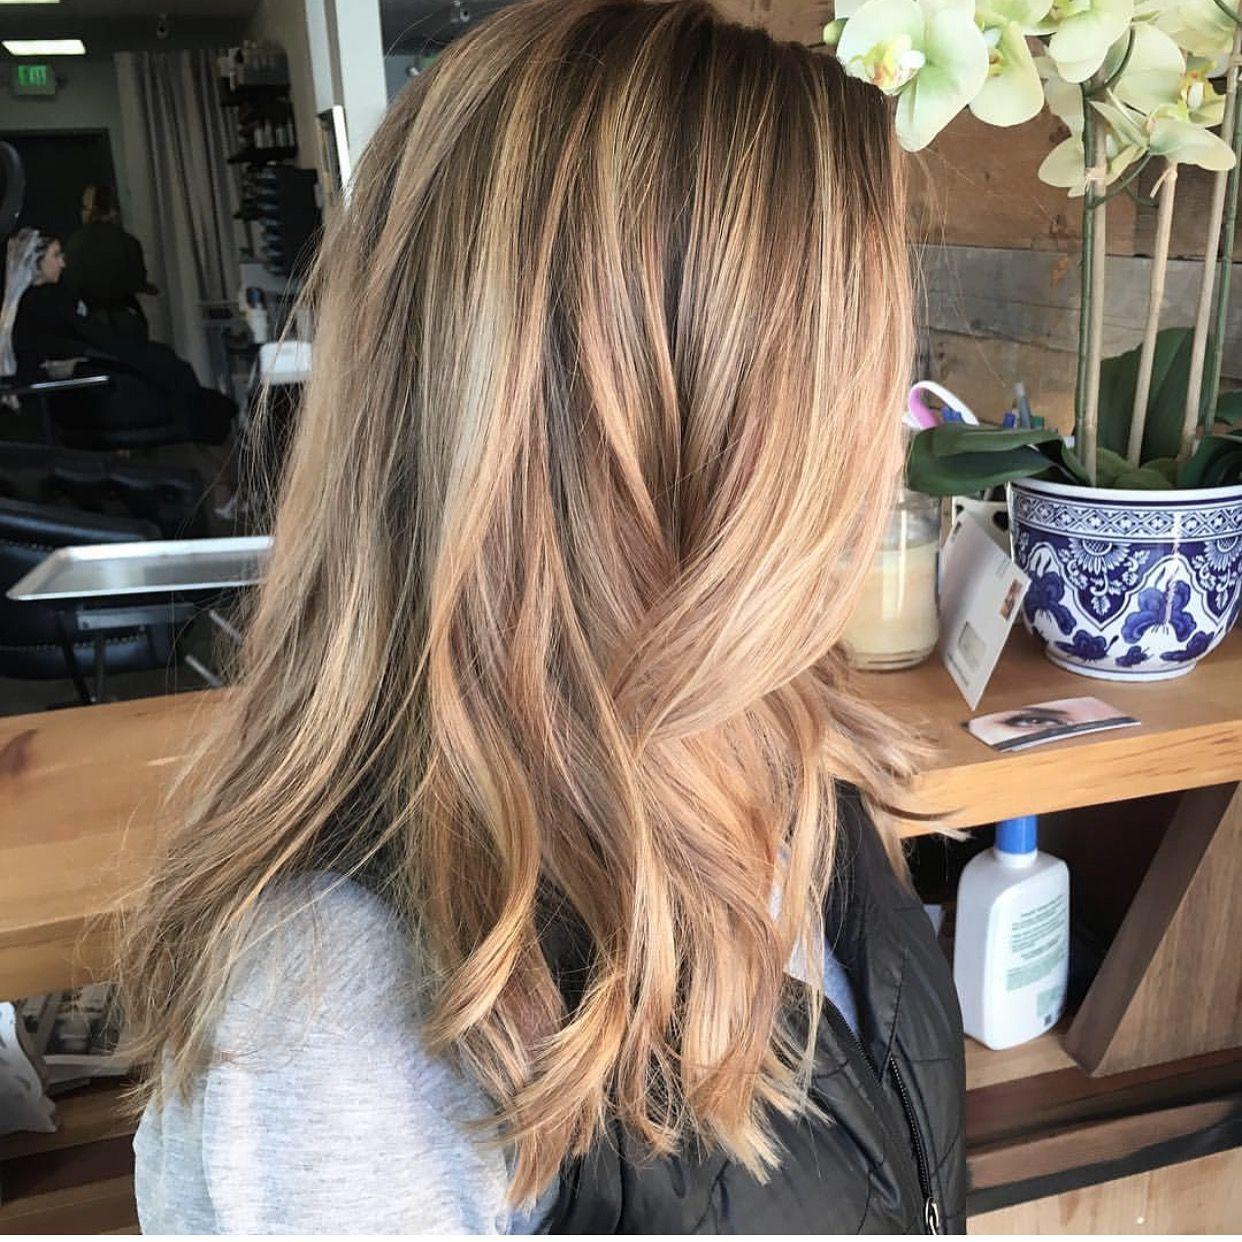 Balayage By Melissa At Studio Posh29 Salon In Sacramento Golden Blonde Haircolor Hair Color Long Hair Styles Balayage